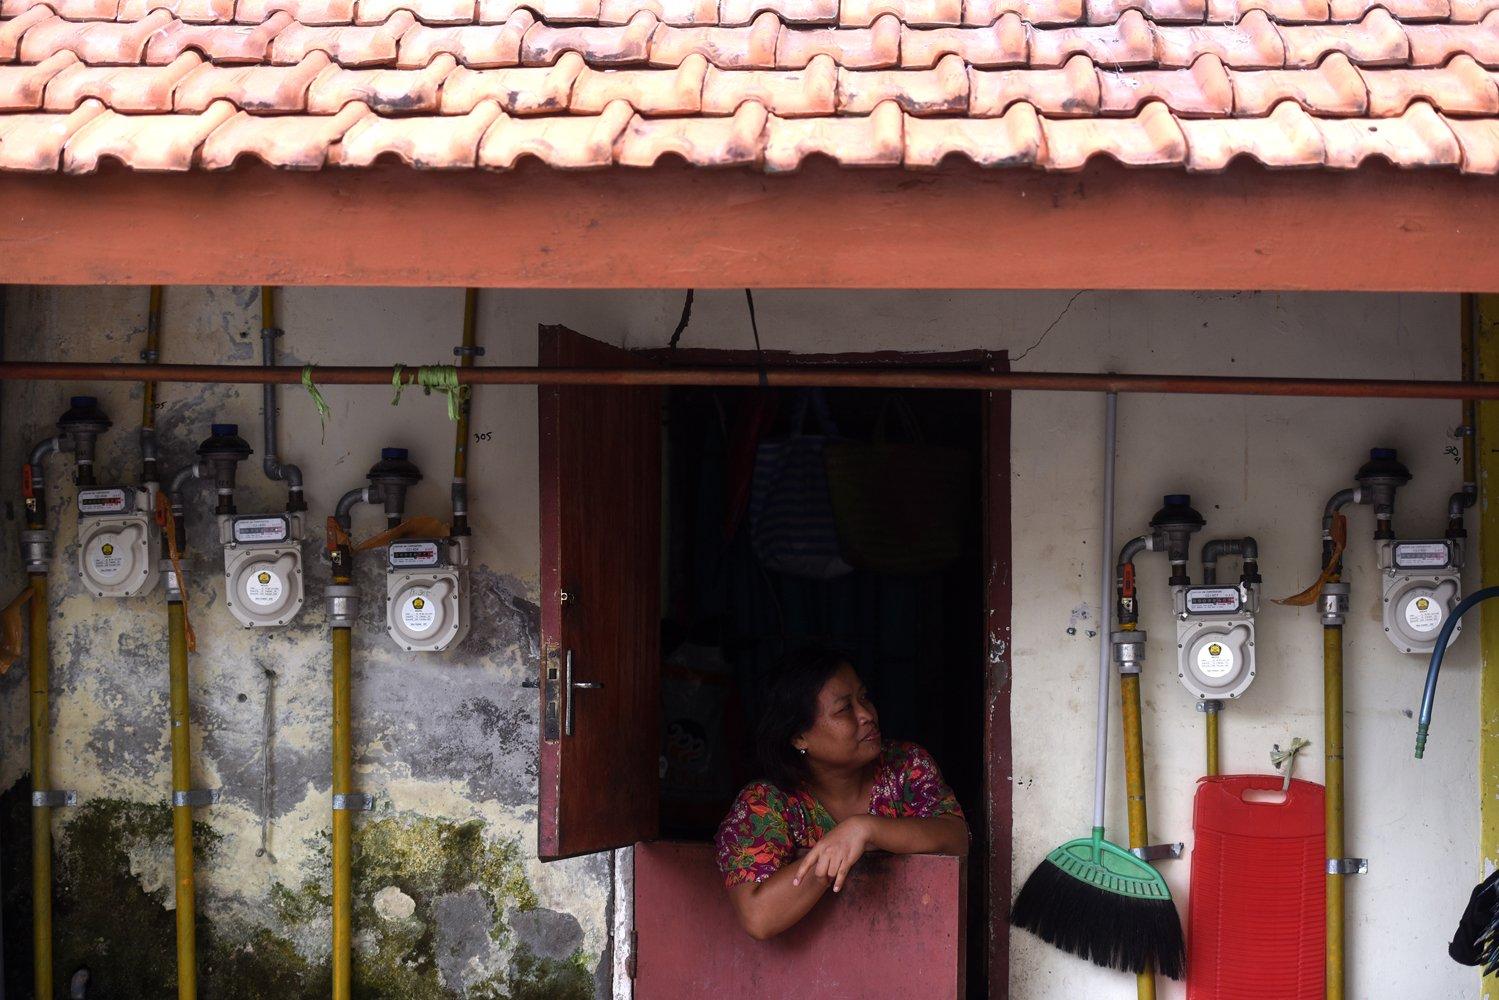 Seorang ibu mengamati meteran gas yang terpasang di dinding rumahnya di salah satu rumah susun di Surabaya, Jawa Timur.